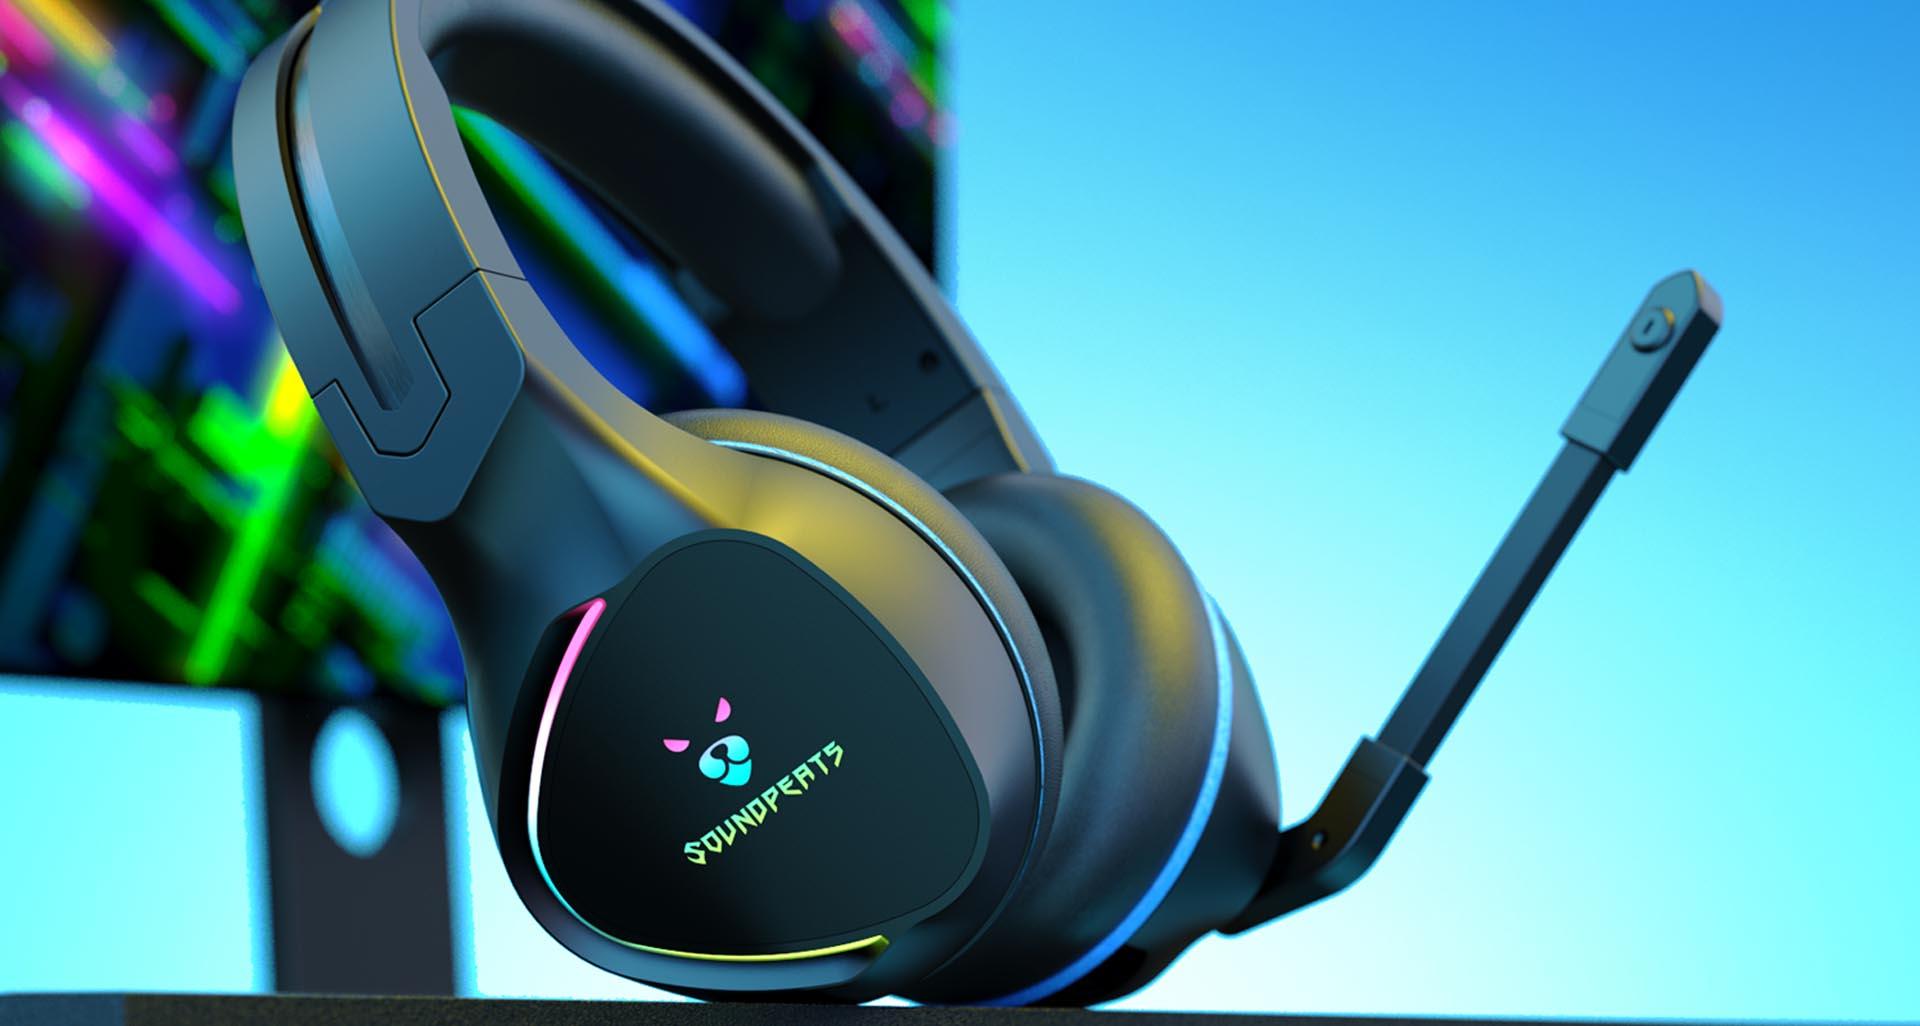 tai nghe gaming soundpeast g1